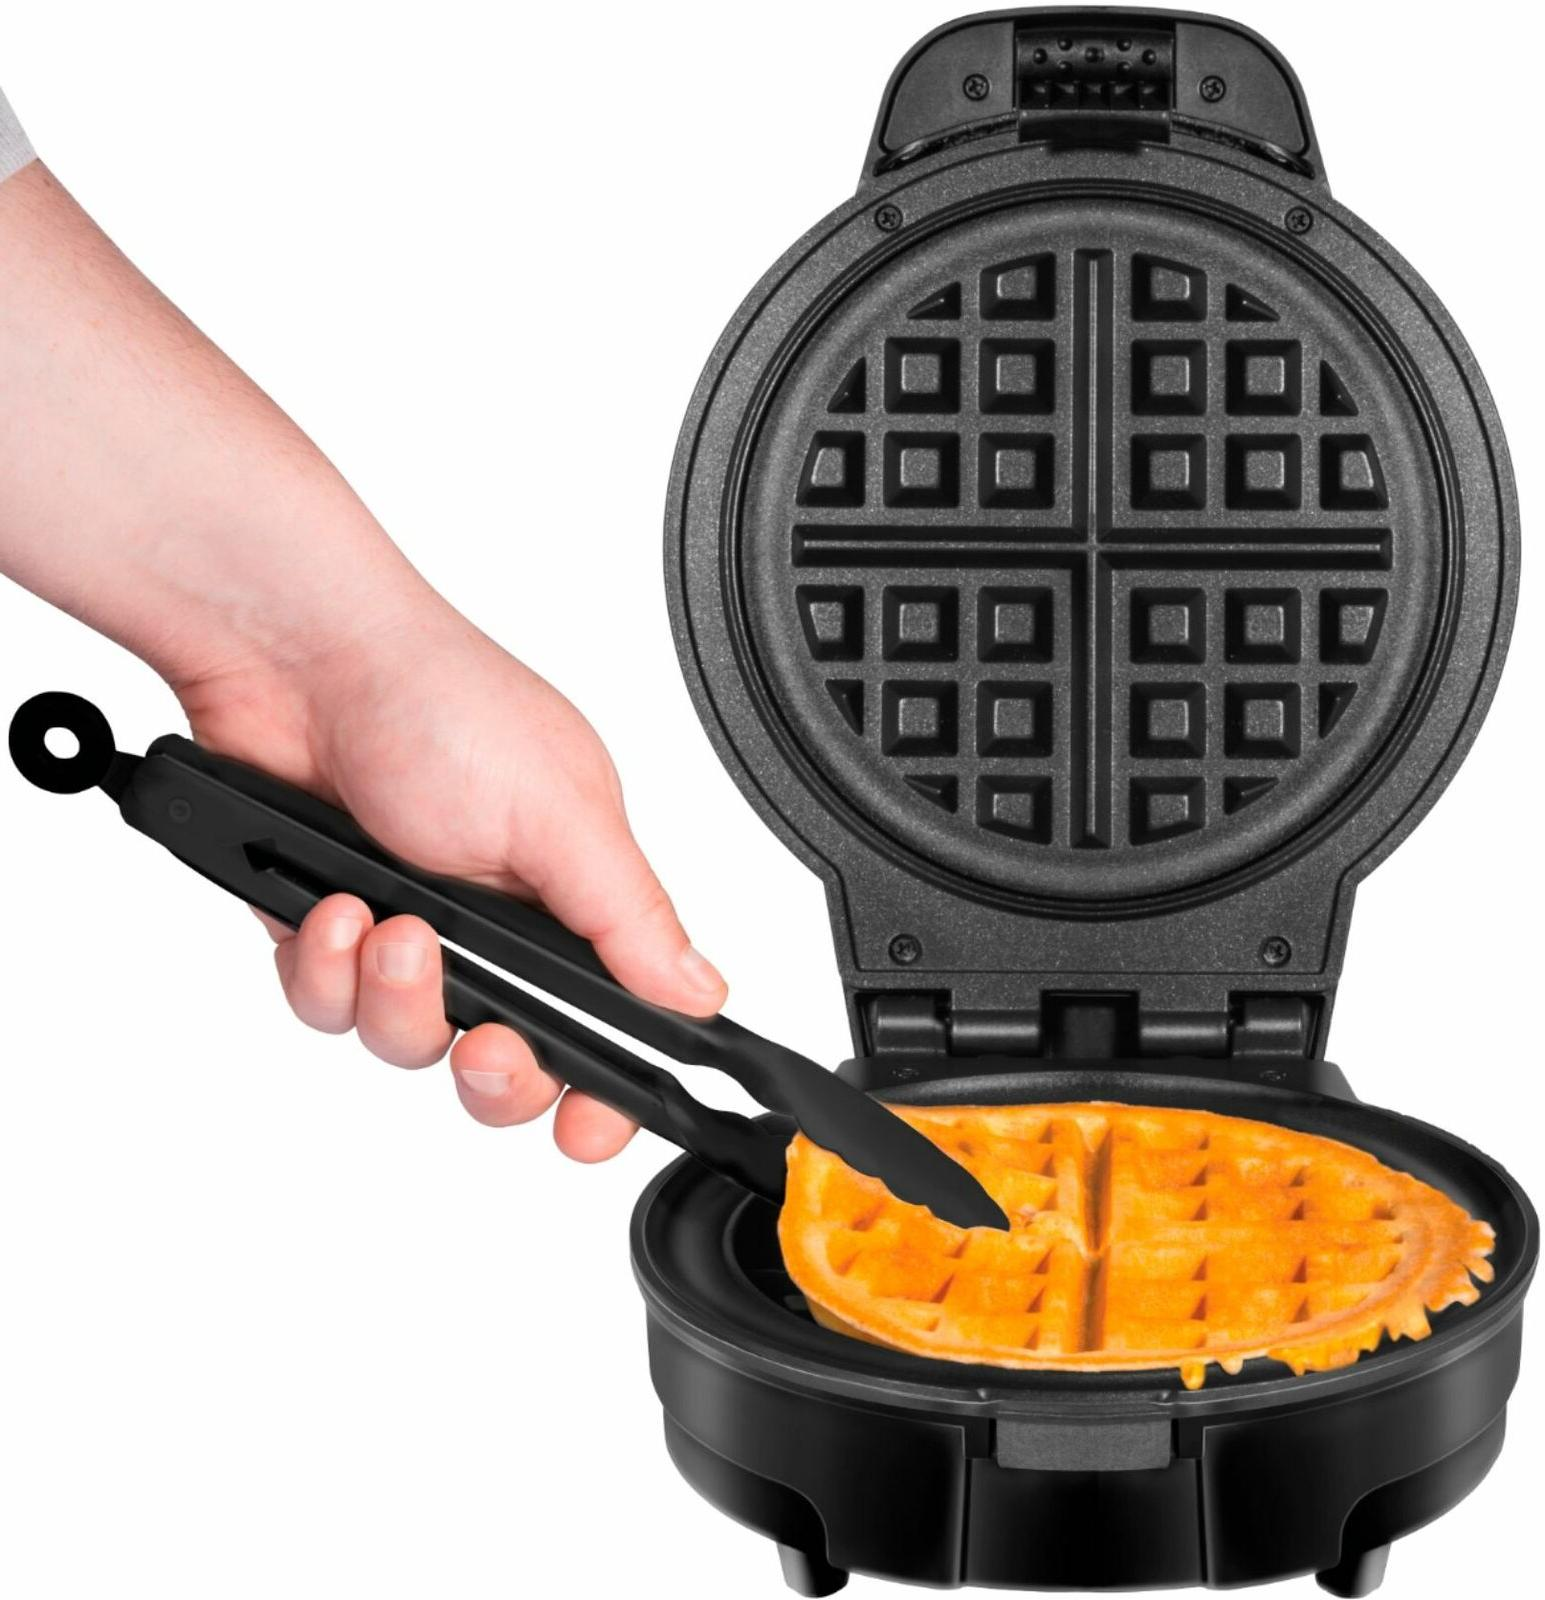 CHEFMAN - Anti-Overflow Waffle Maker Free